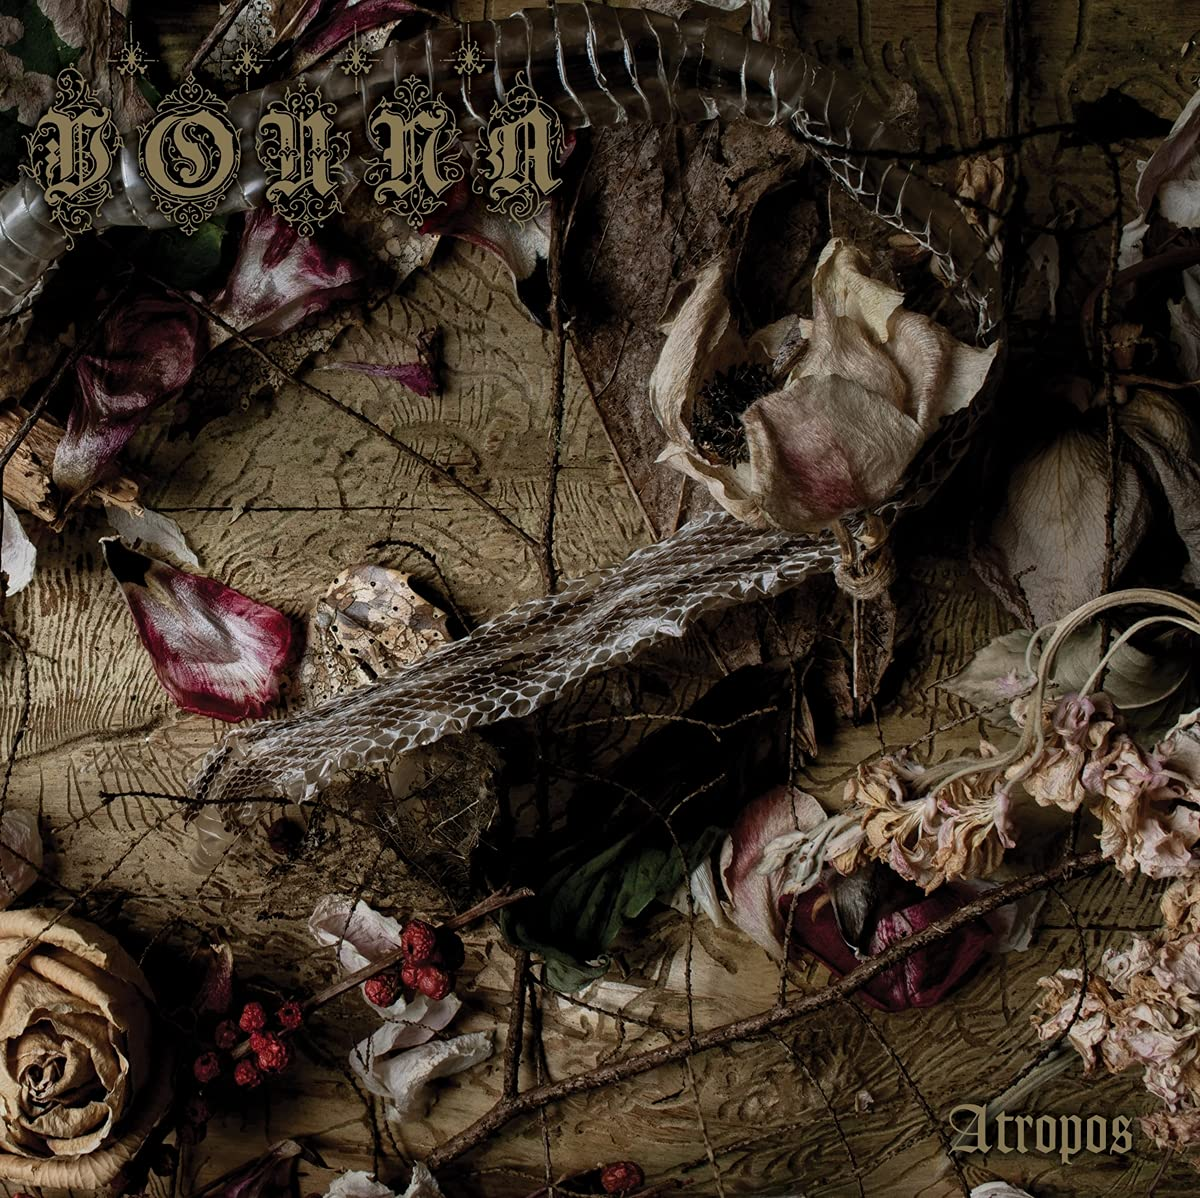 Vouna - Atropos (2021) [FLAC] Download